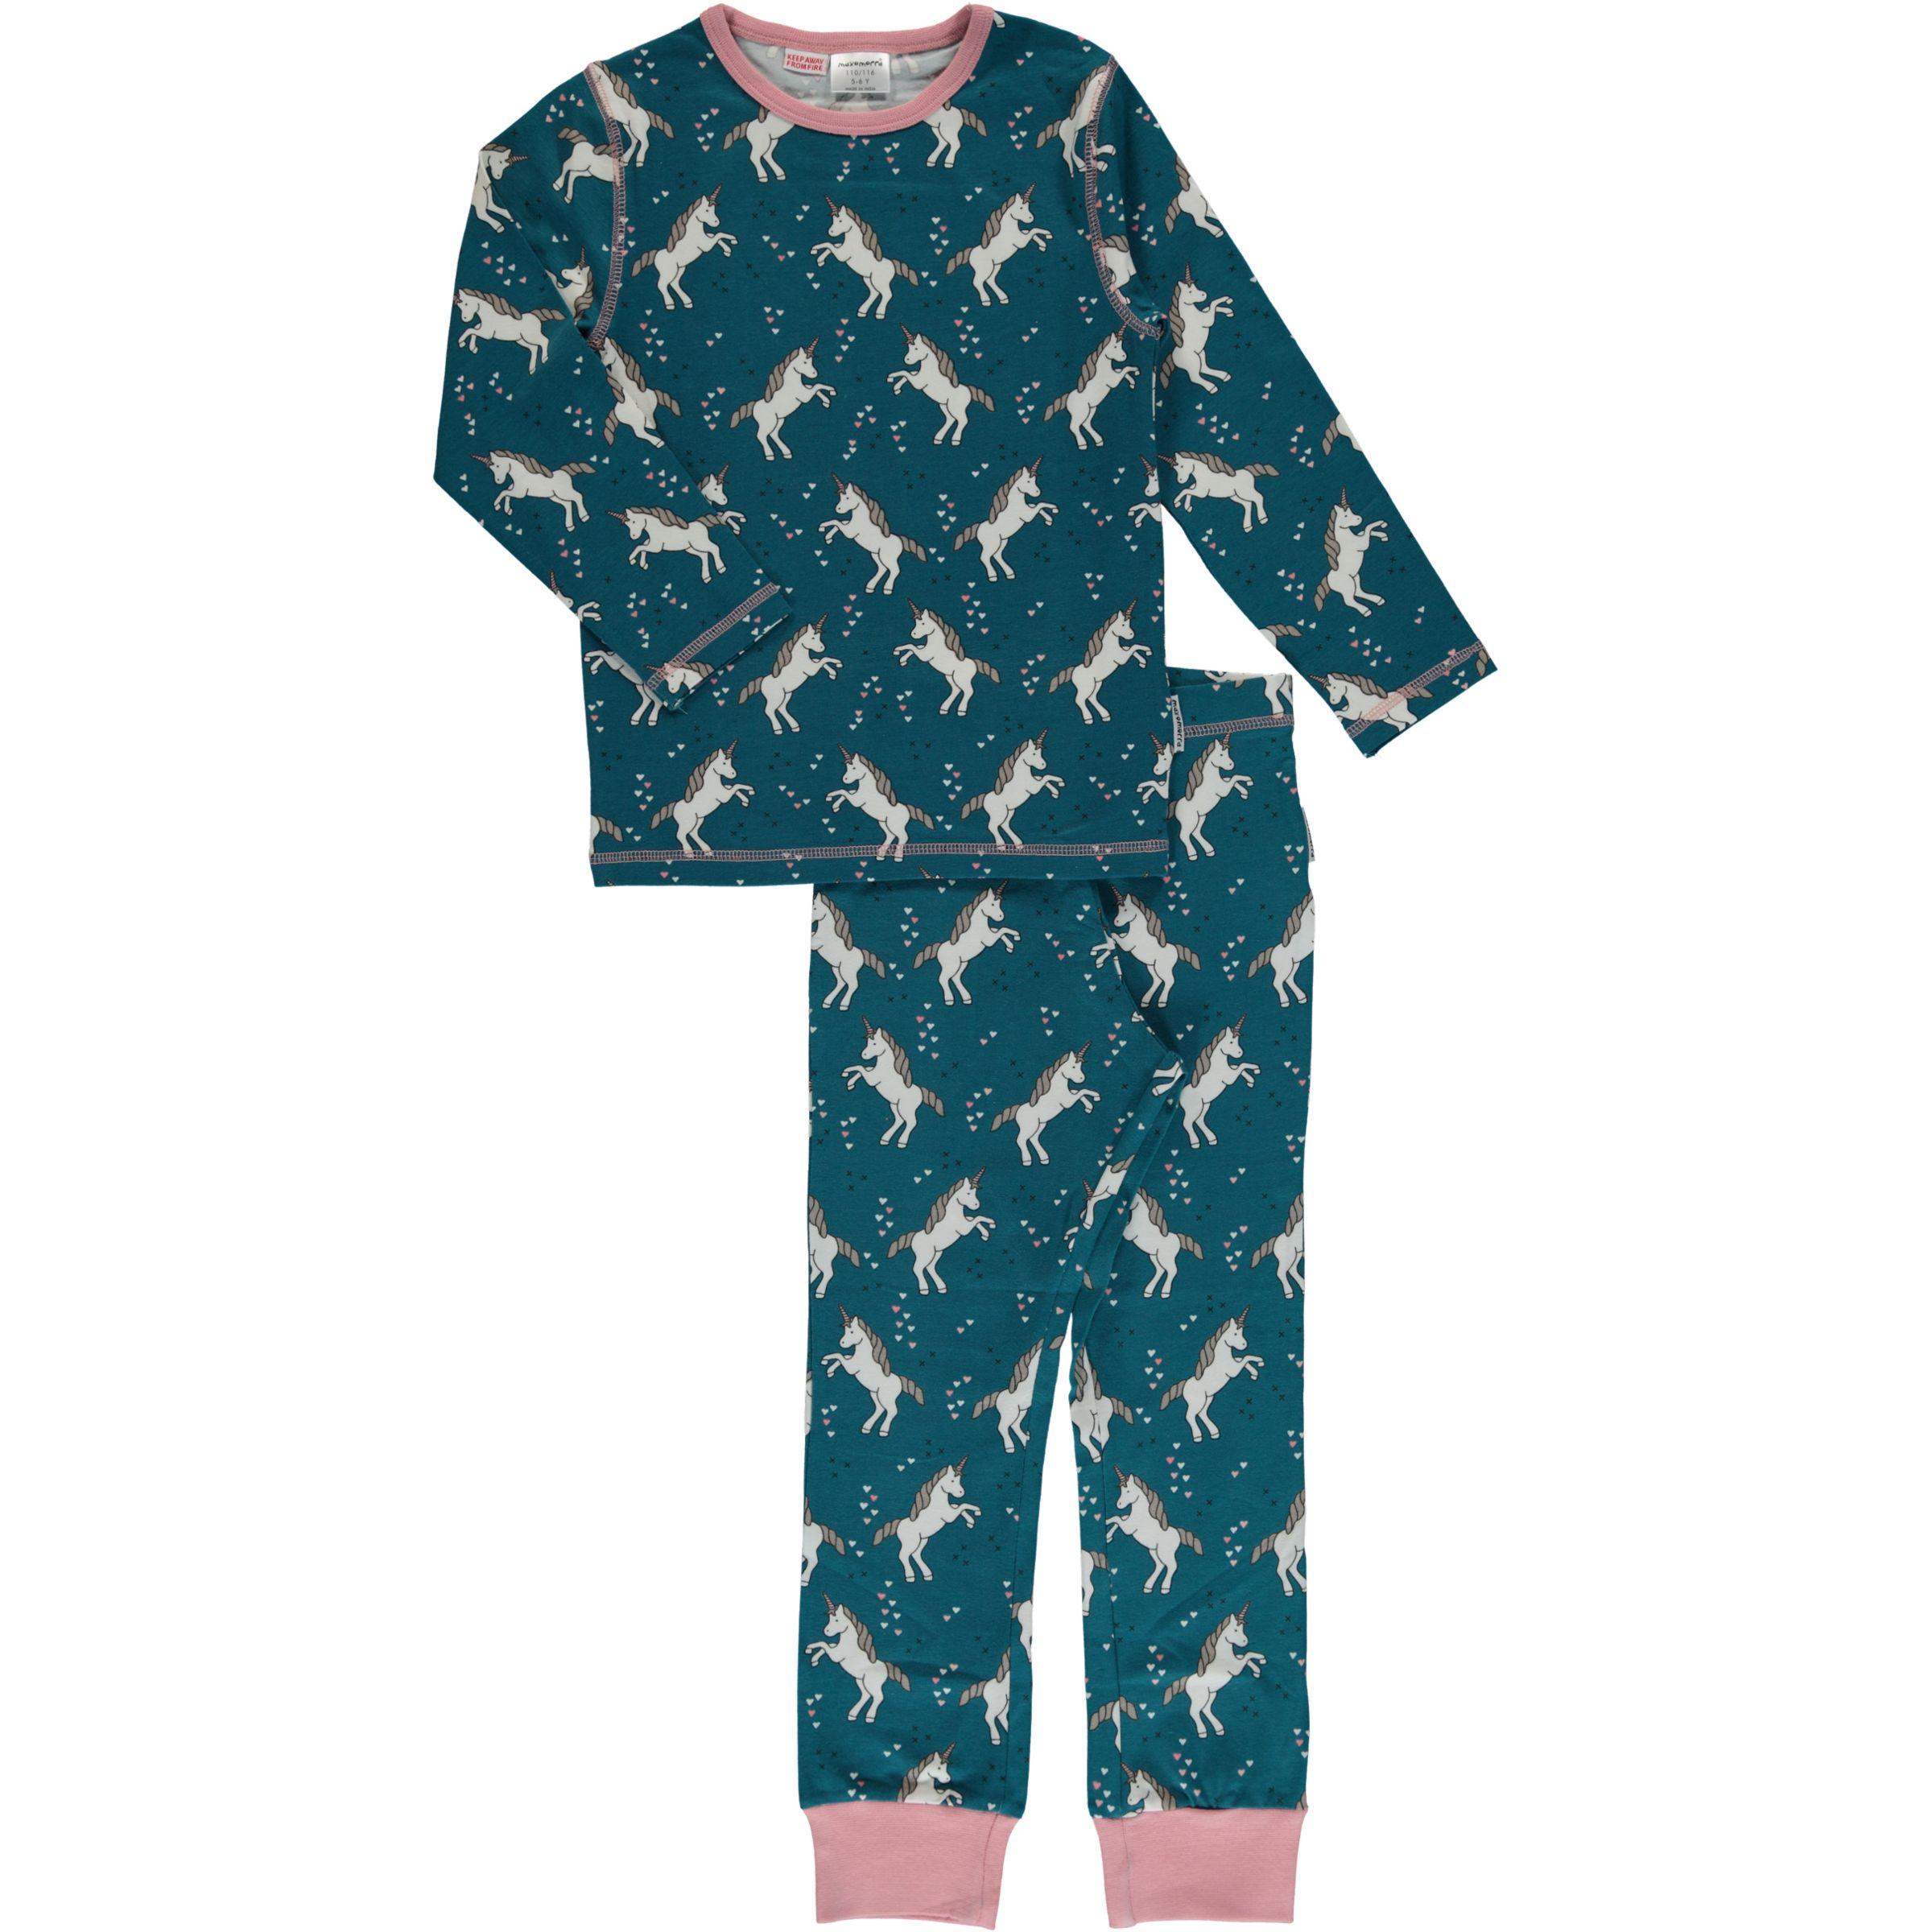 df015df51b56e Maxomorra organic cotton pyjamas in unicorn dreams print (122-128cm 6-8  years)